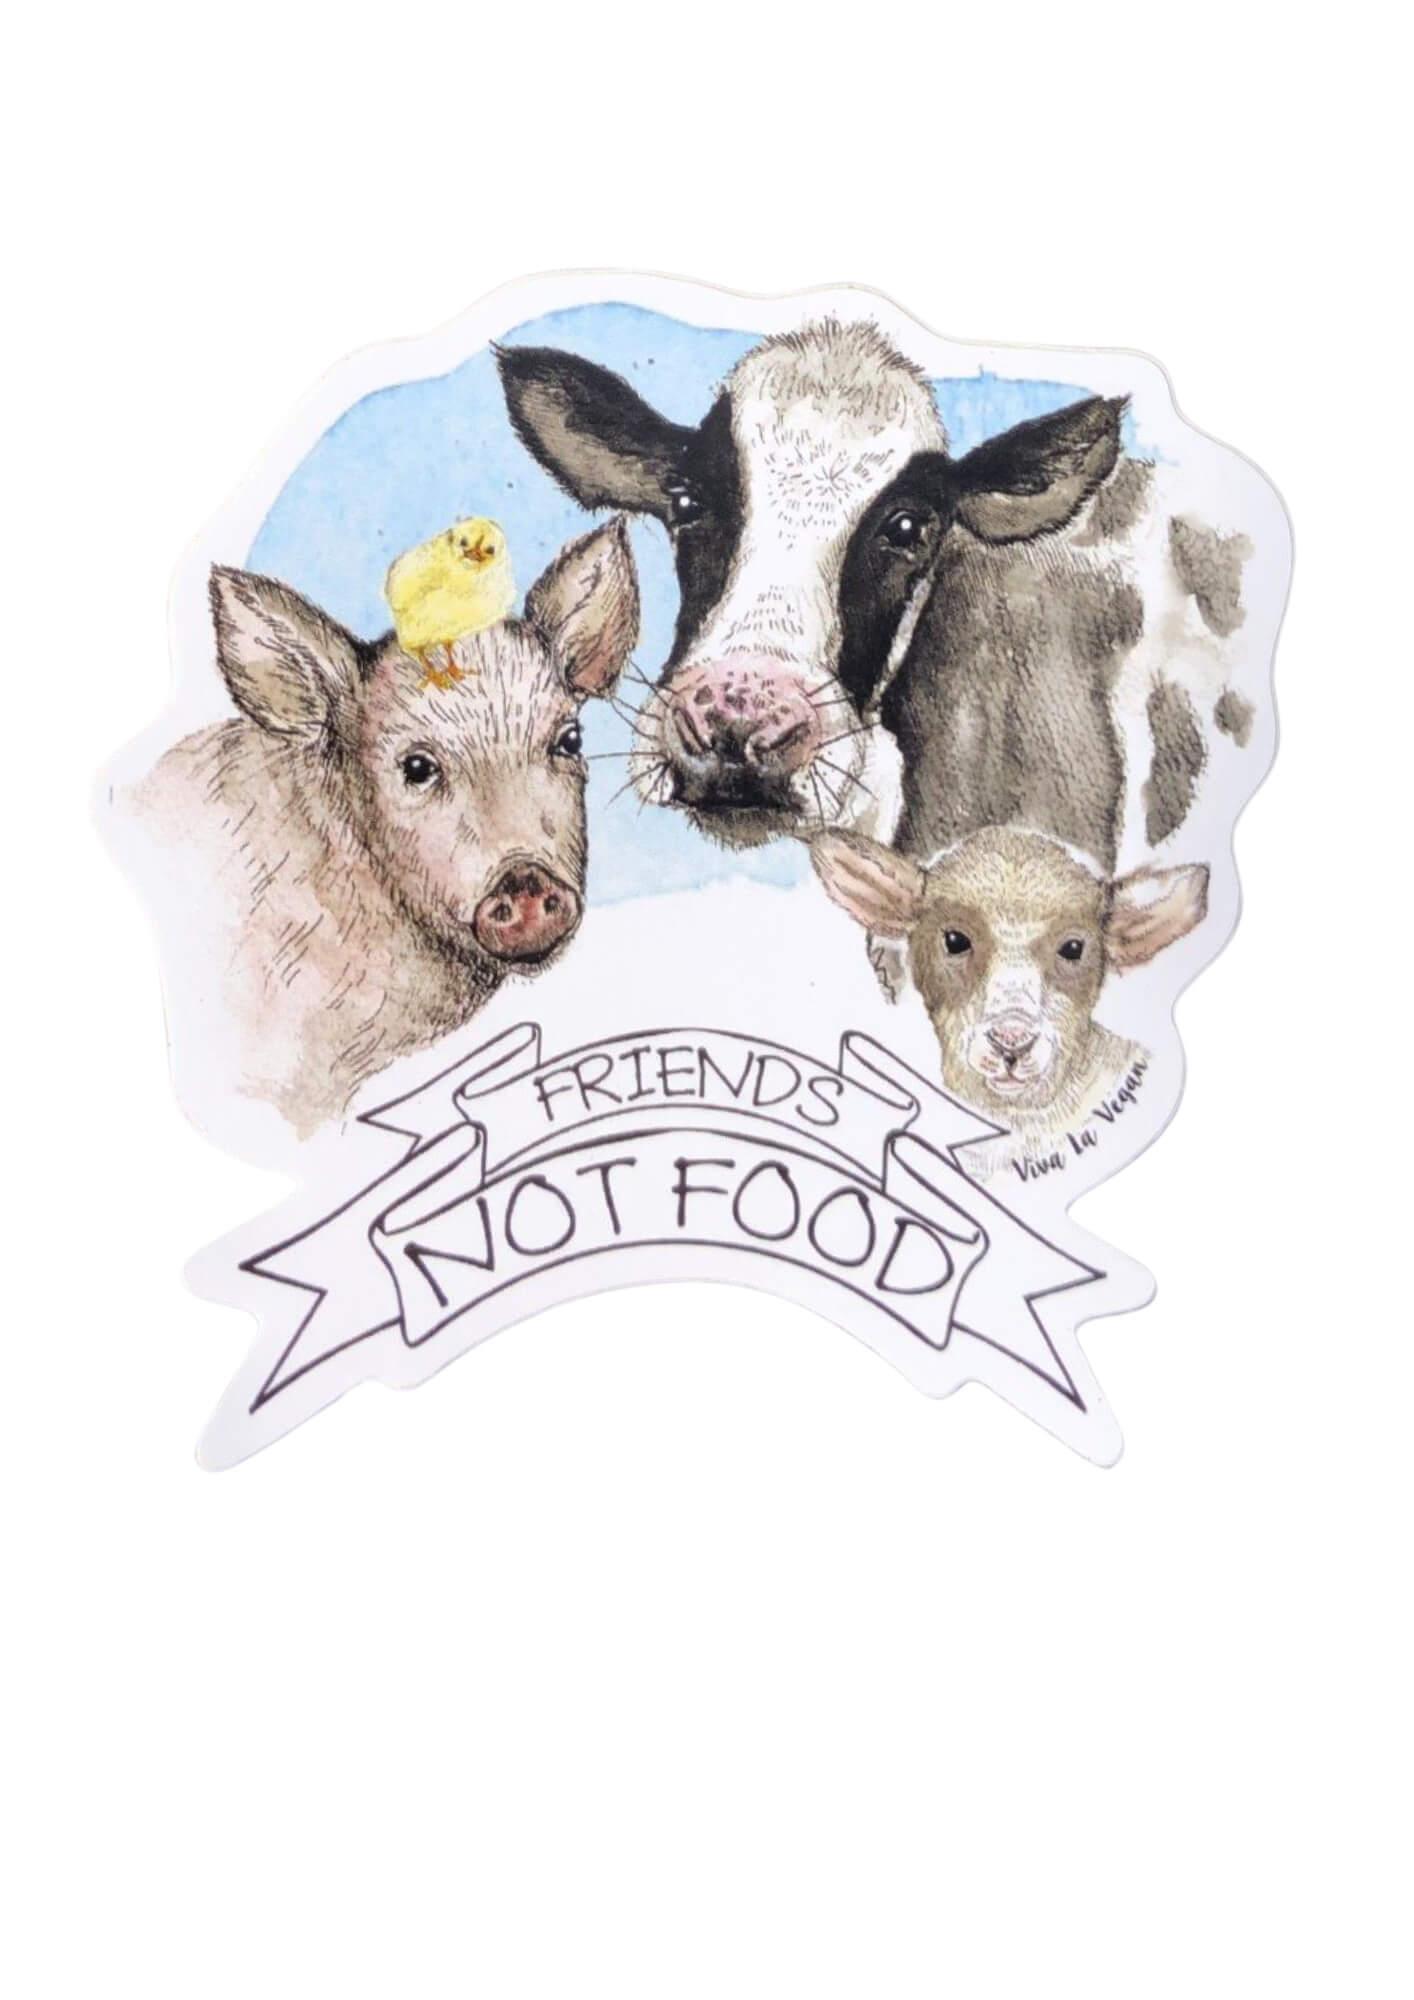 Friends not food vinyl sticker by eco ethical brand Viva La Vegan